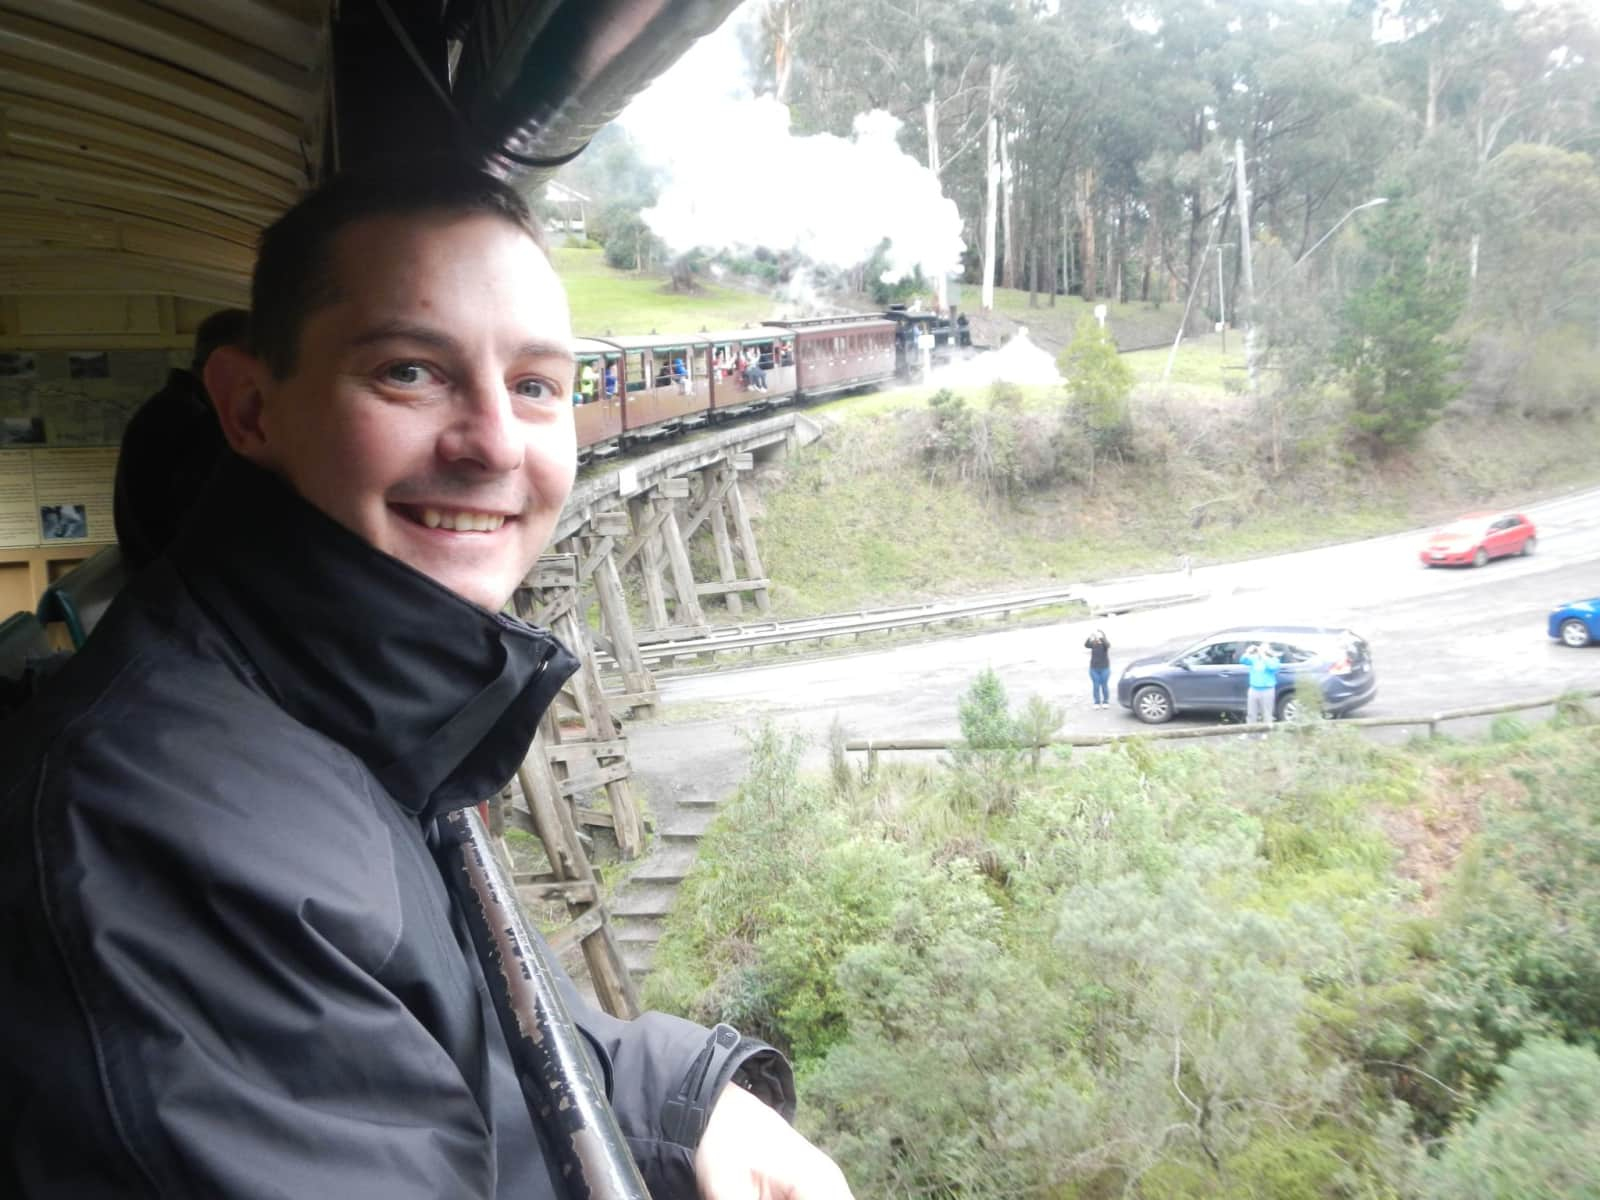 Ryan from Melbourne, Victoria, Australia